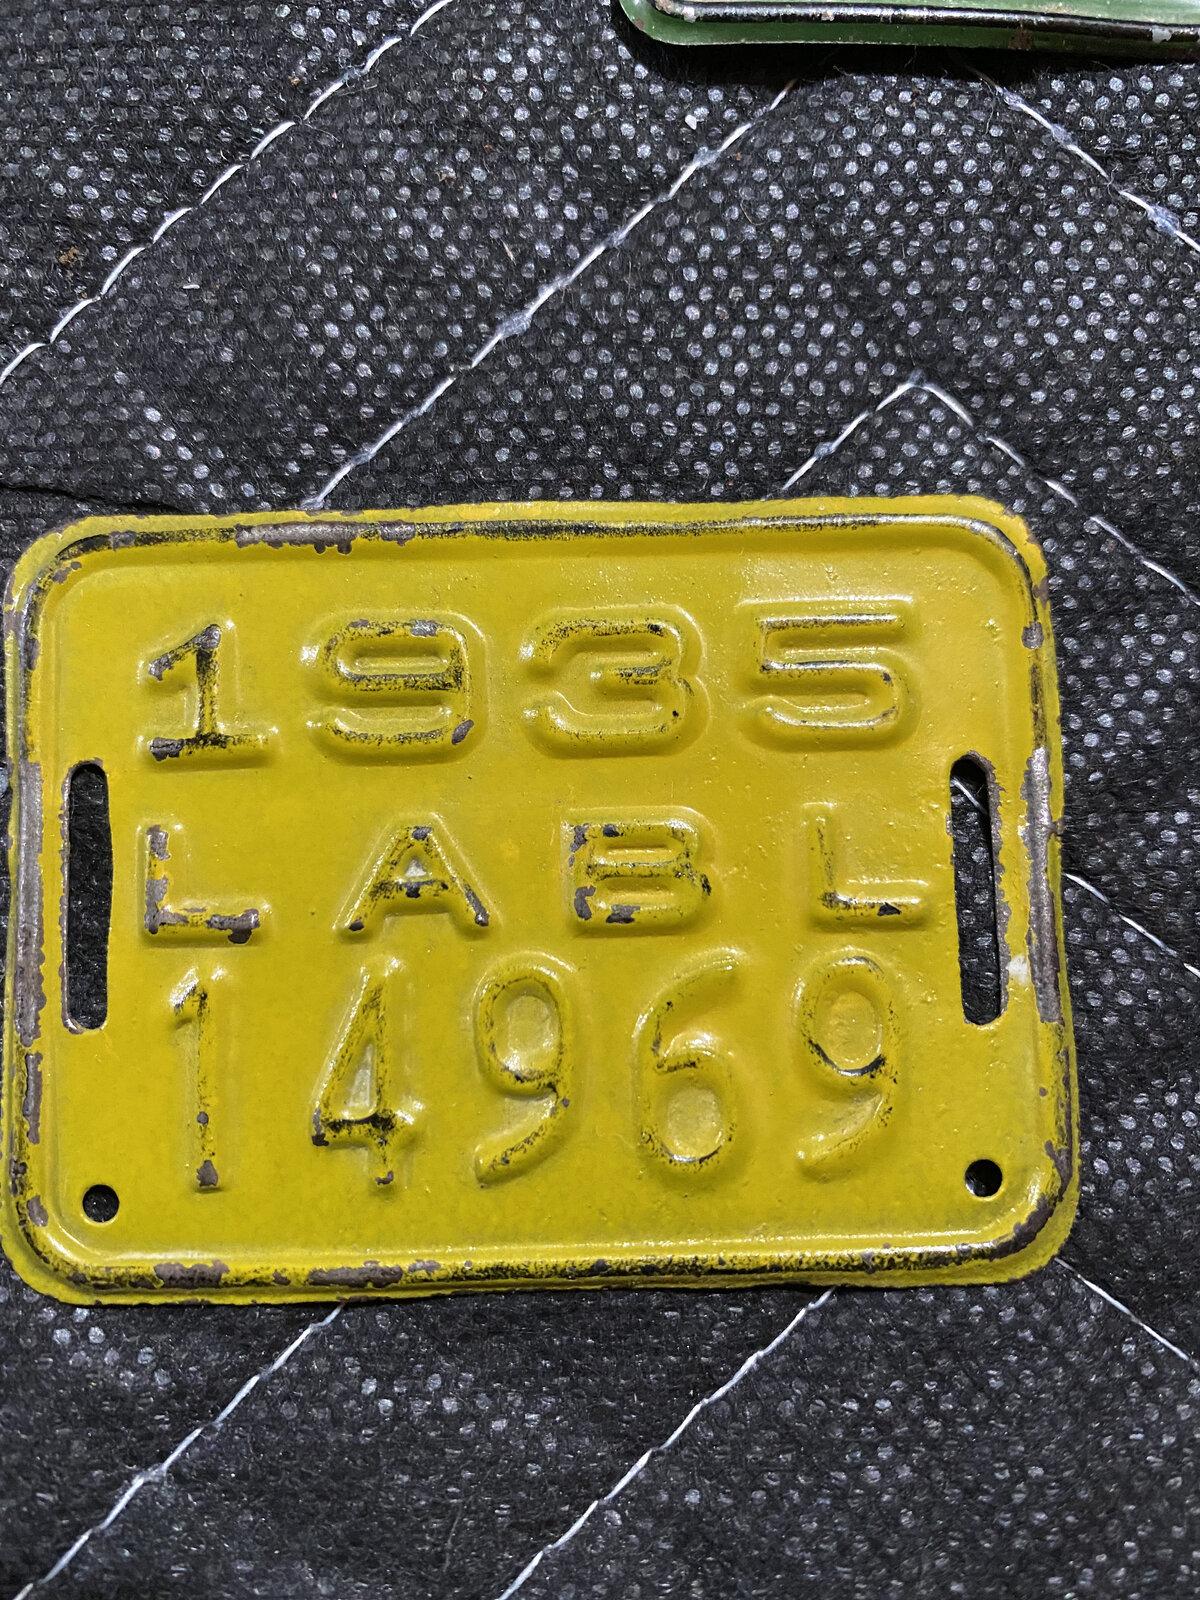 D4DC7166-9991-4666-9DFC-78C6C3B96E11.jpeg